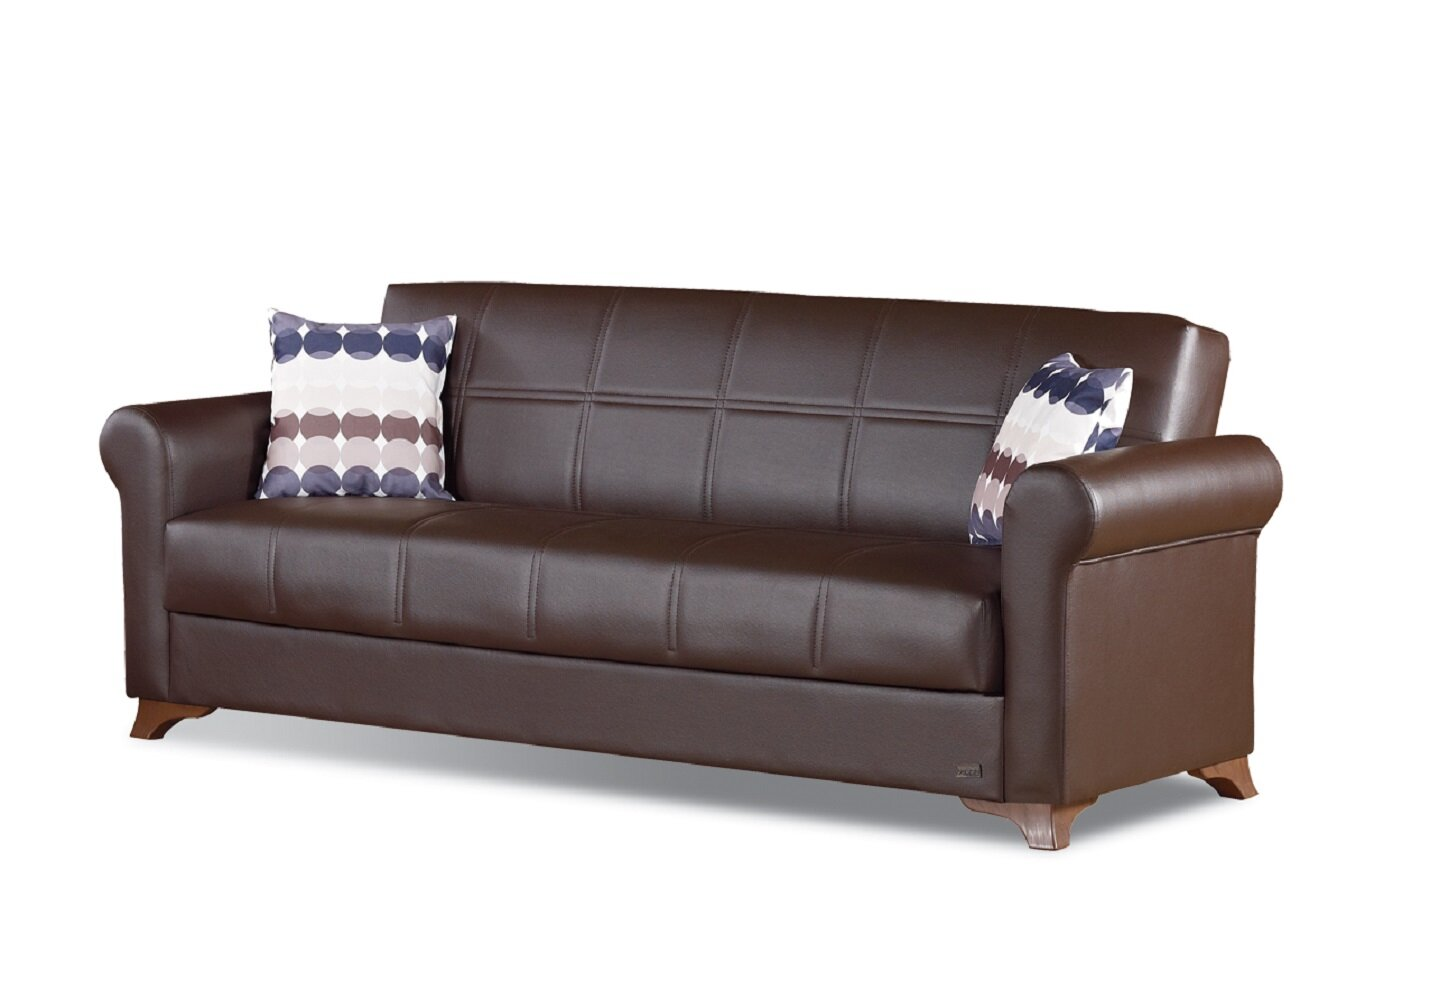 Padron Convertible Sleeper Sofa